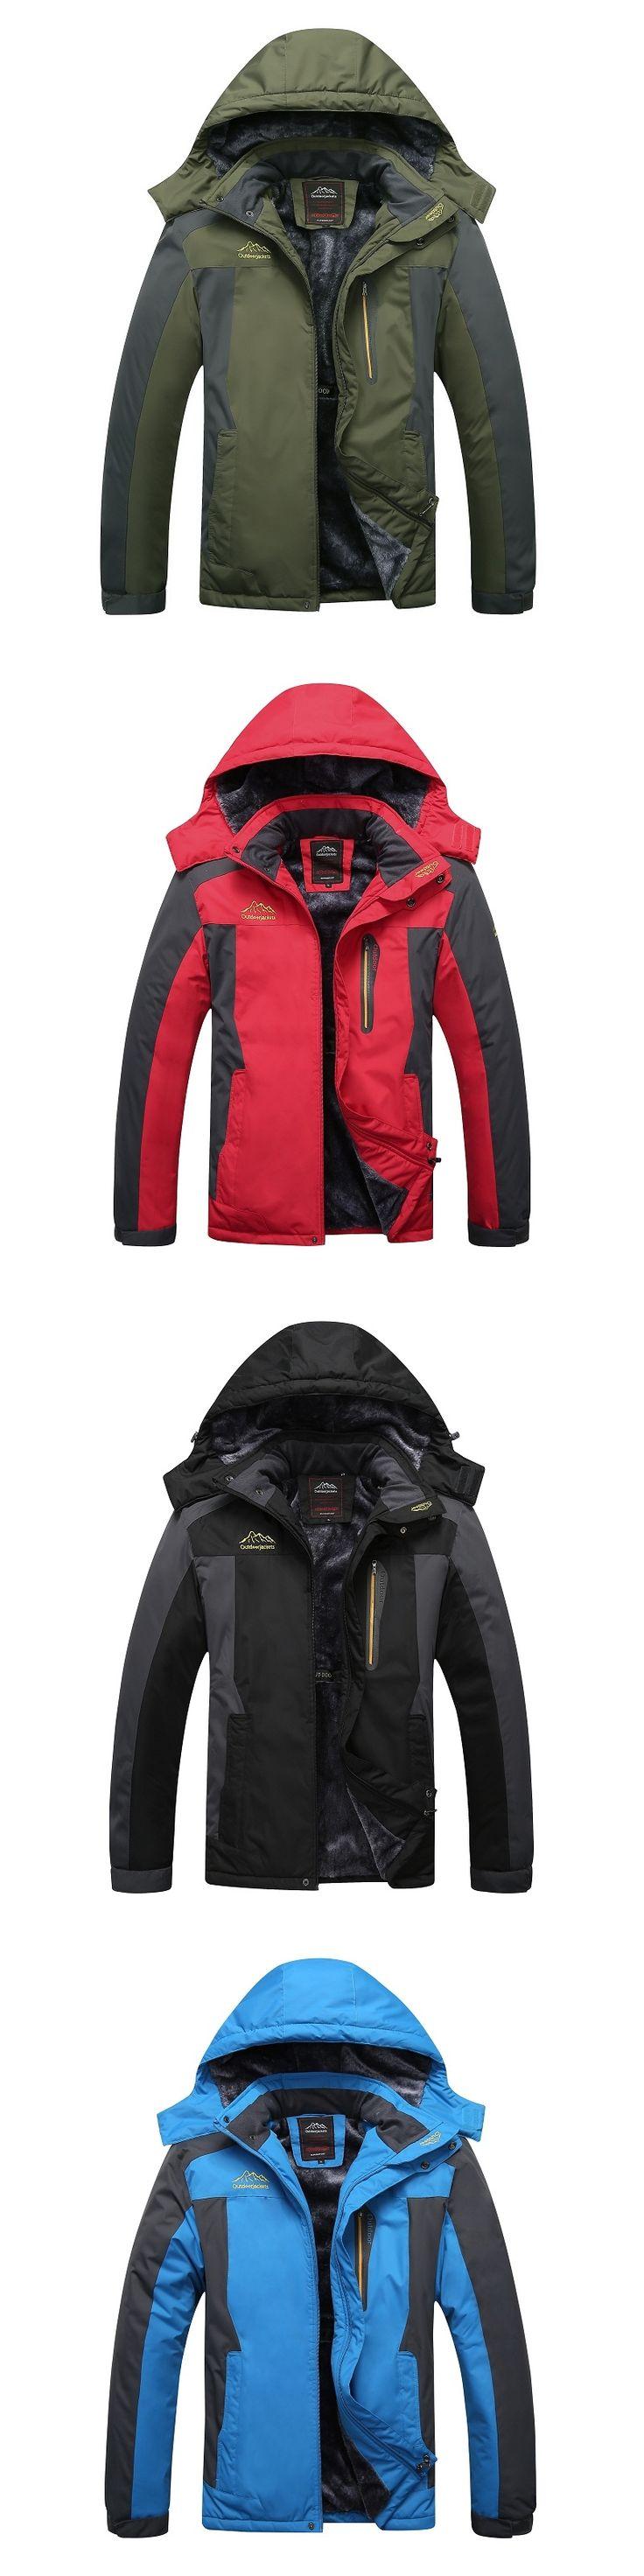 2016 Softshell Jacket Men Hooded Jacket Waterproof Windproof Thermal Jacket Warm Downhill  Fleece Zipper Cotton Coats with Hat